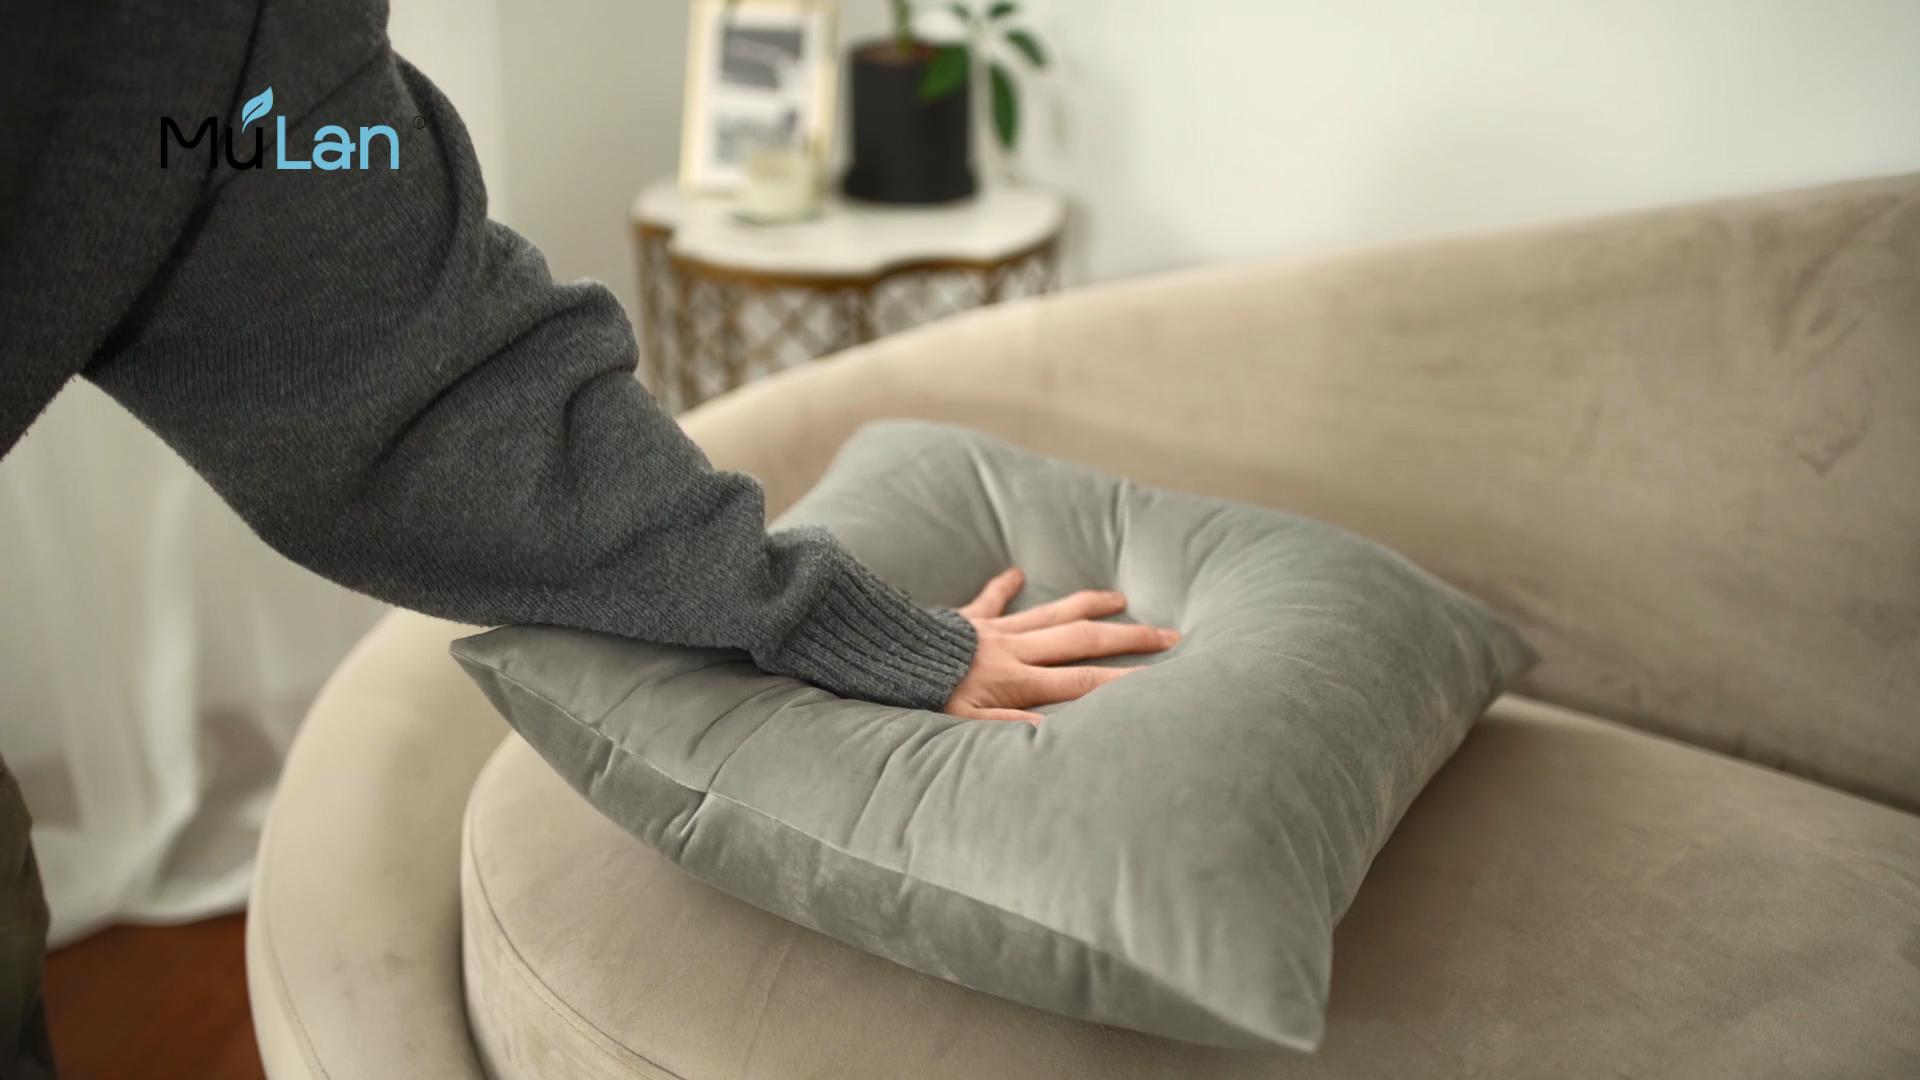 Оптовая продажа, мягкая квадратная бархатная наволочка, роскошная наволочка для дивана, спальни, автомобиля, 18x18 дюймов, 45x45 см, наволочка для подушки